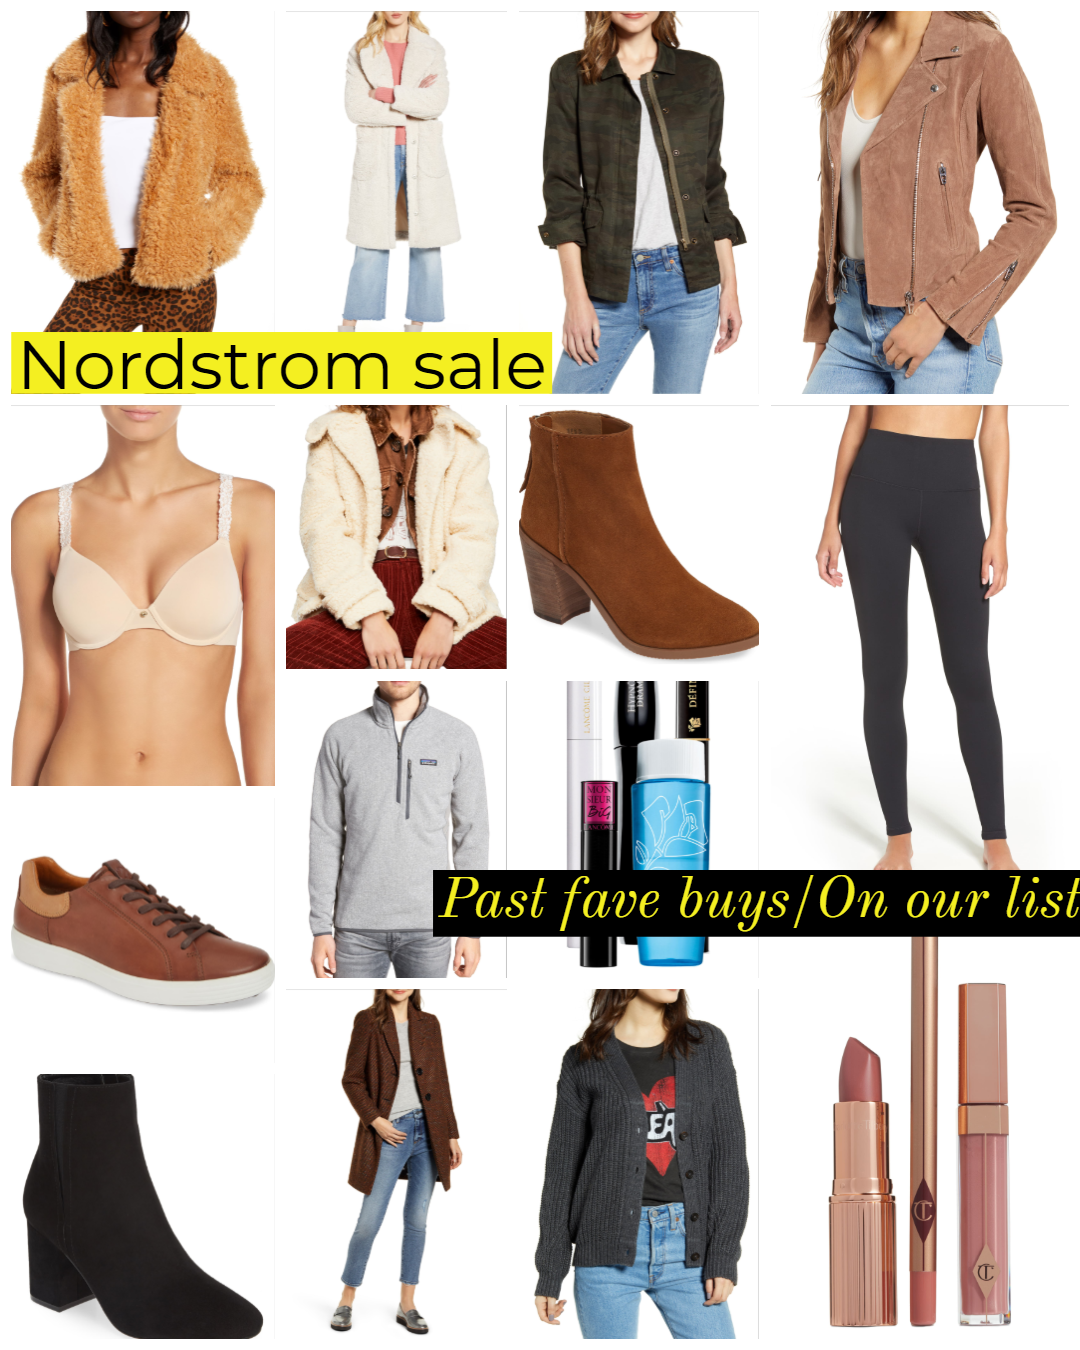 nordstrom anniversary sale, nordstrom sale picks